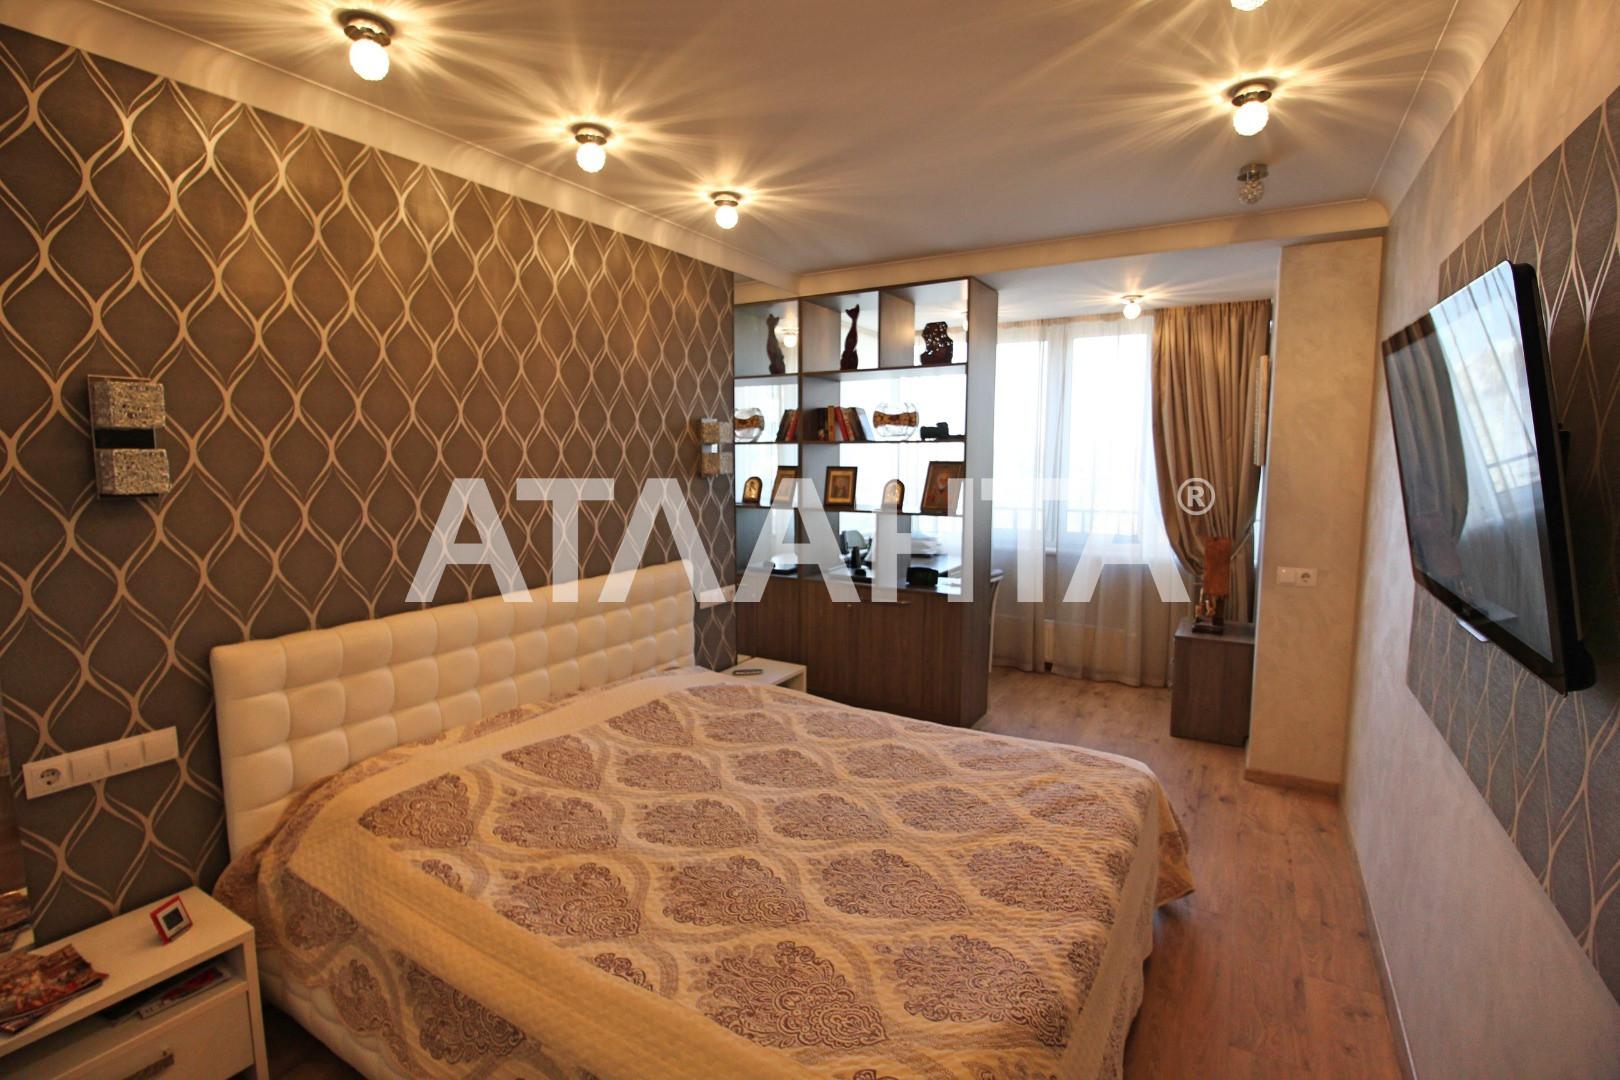 Продается 4-комнатная Квартира на ул. Ул. Богатырская — 175 000 у.е. (фото №5)